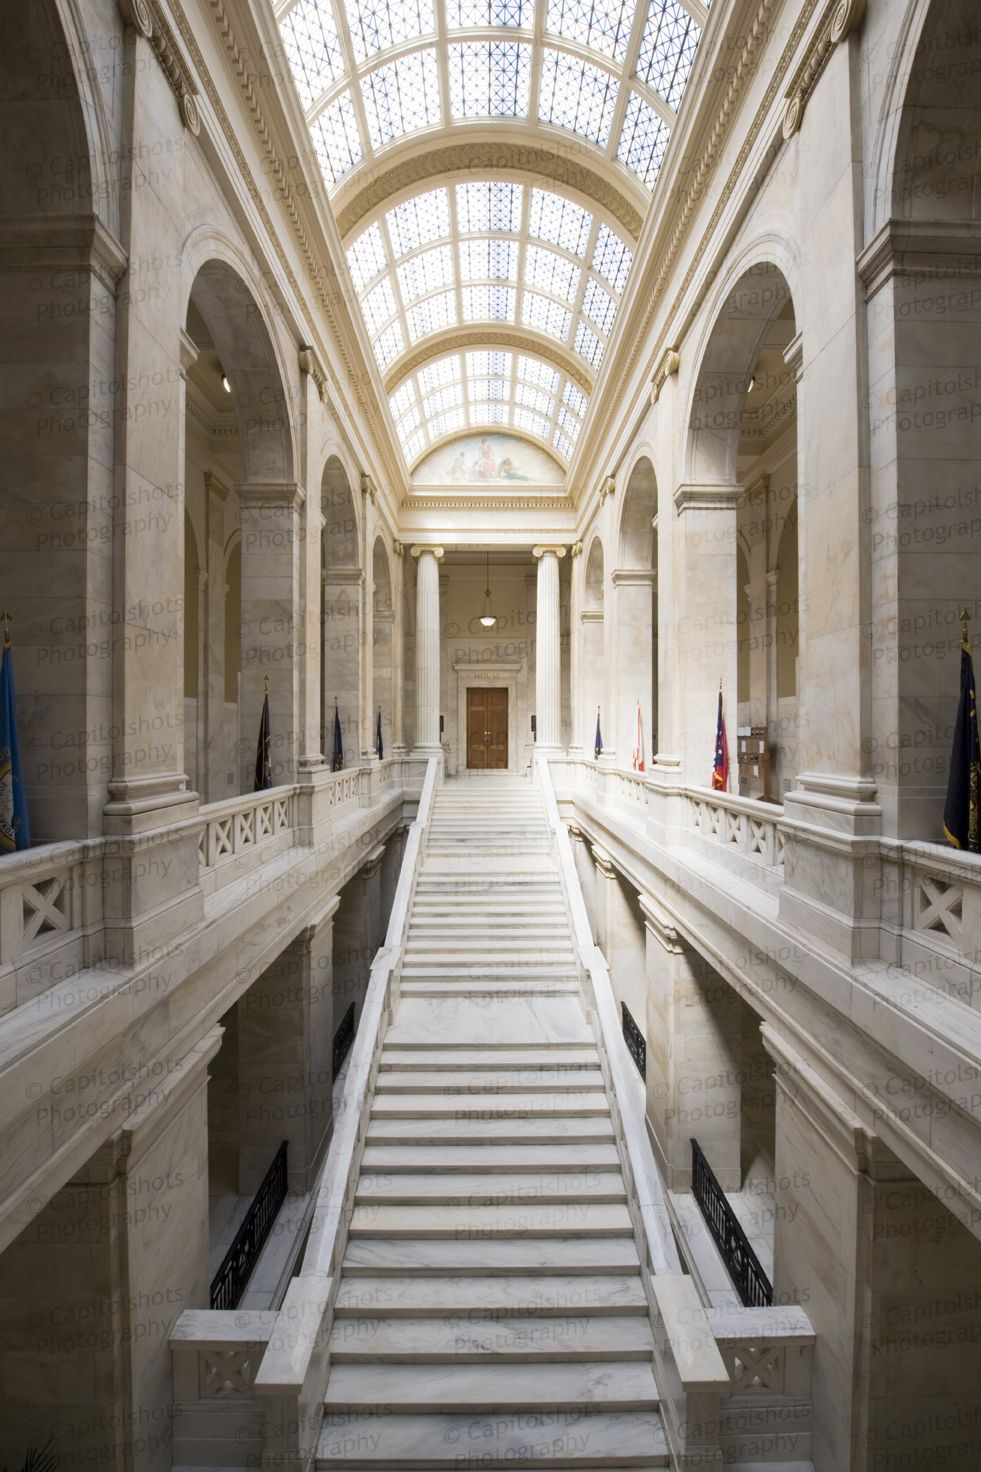 Arkansas State Capitol Building, Little Rock. The floors